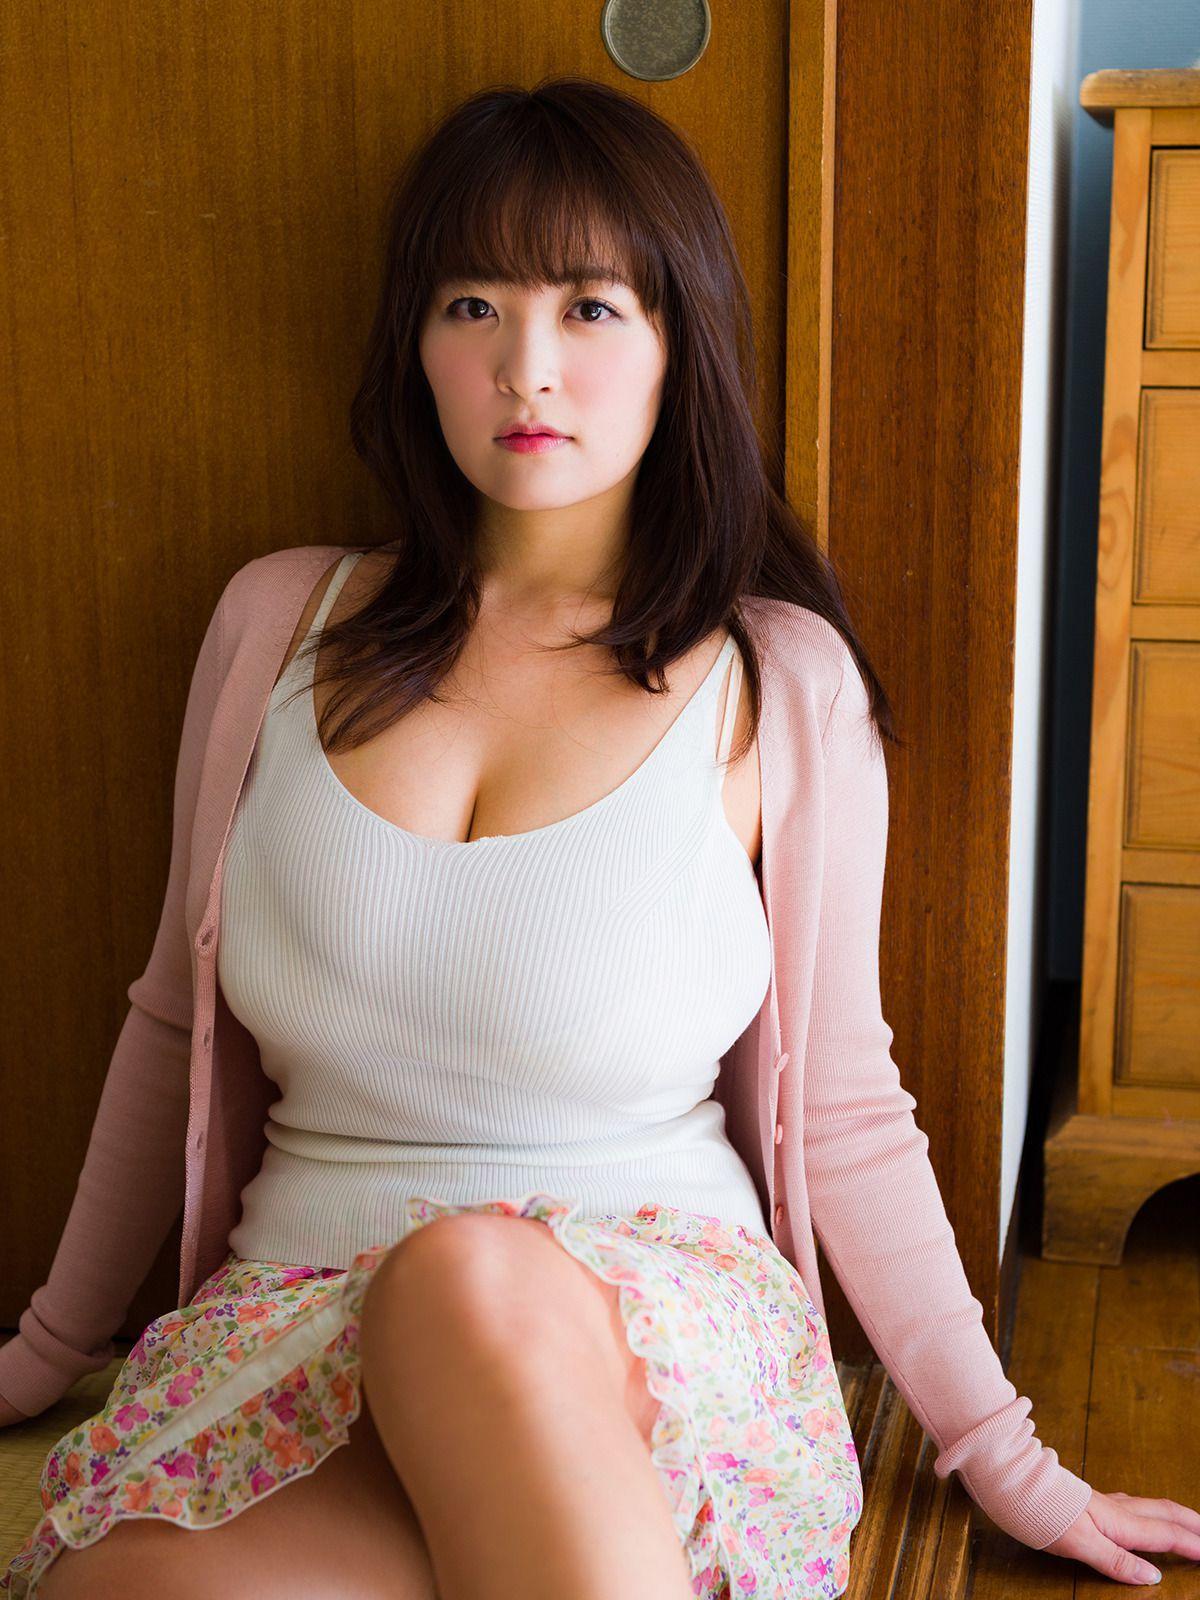 [Sabra.net] Strictly Girl 柳瀬早紀 - 昼下がりのIカップ